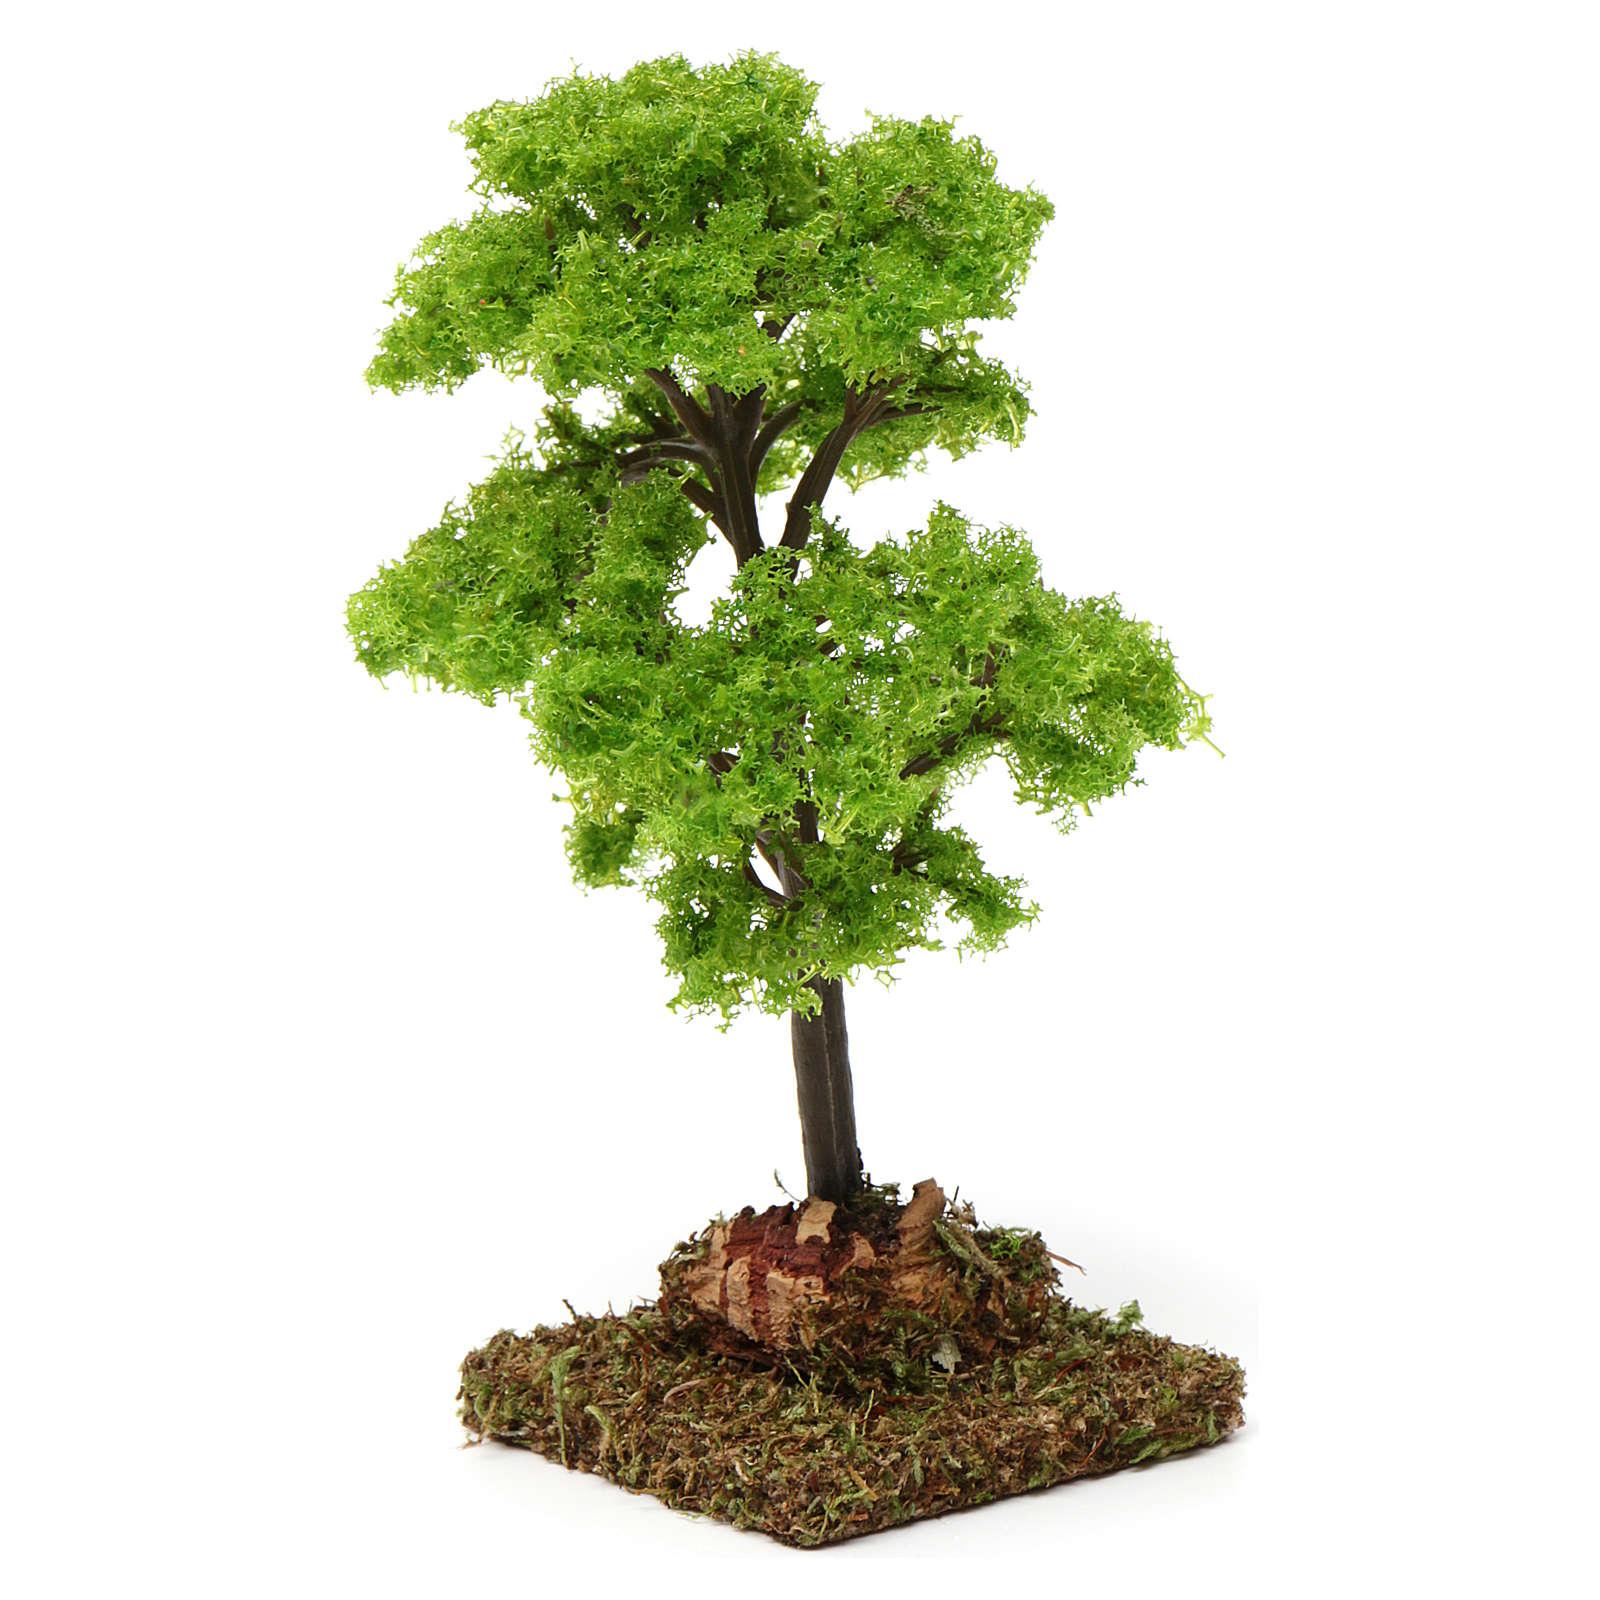 Árbol verde para belén 7-10 cm de altura media 4